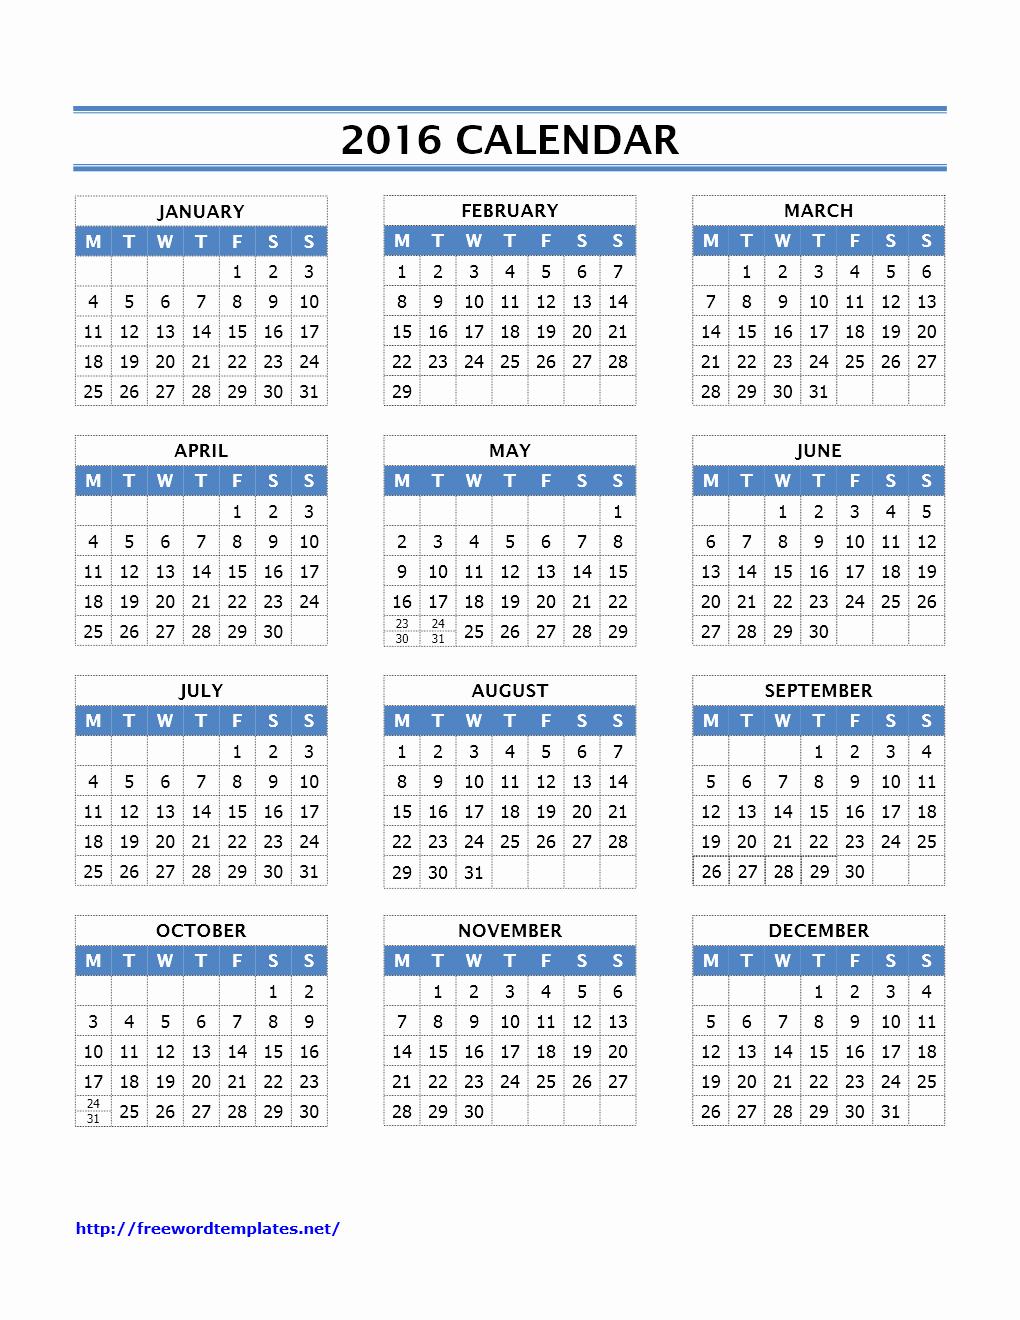 Free Downloadable 2016 Calendar Template Fresh October 2016 Calendar Printable E Page – 2017 Printable